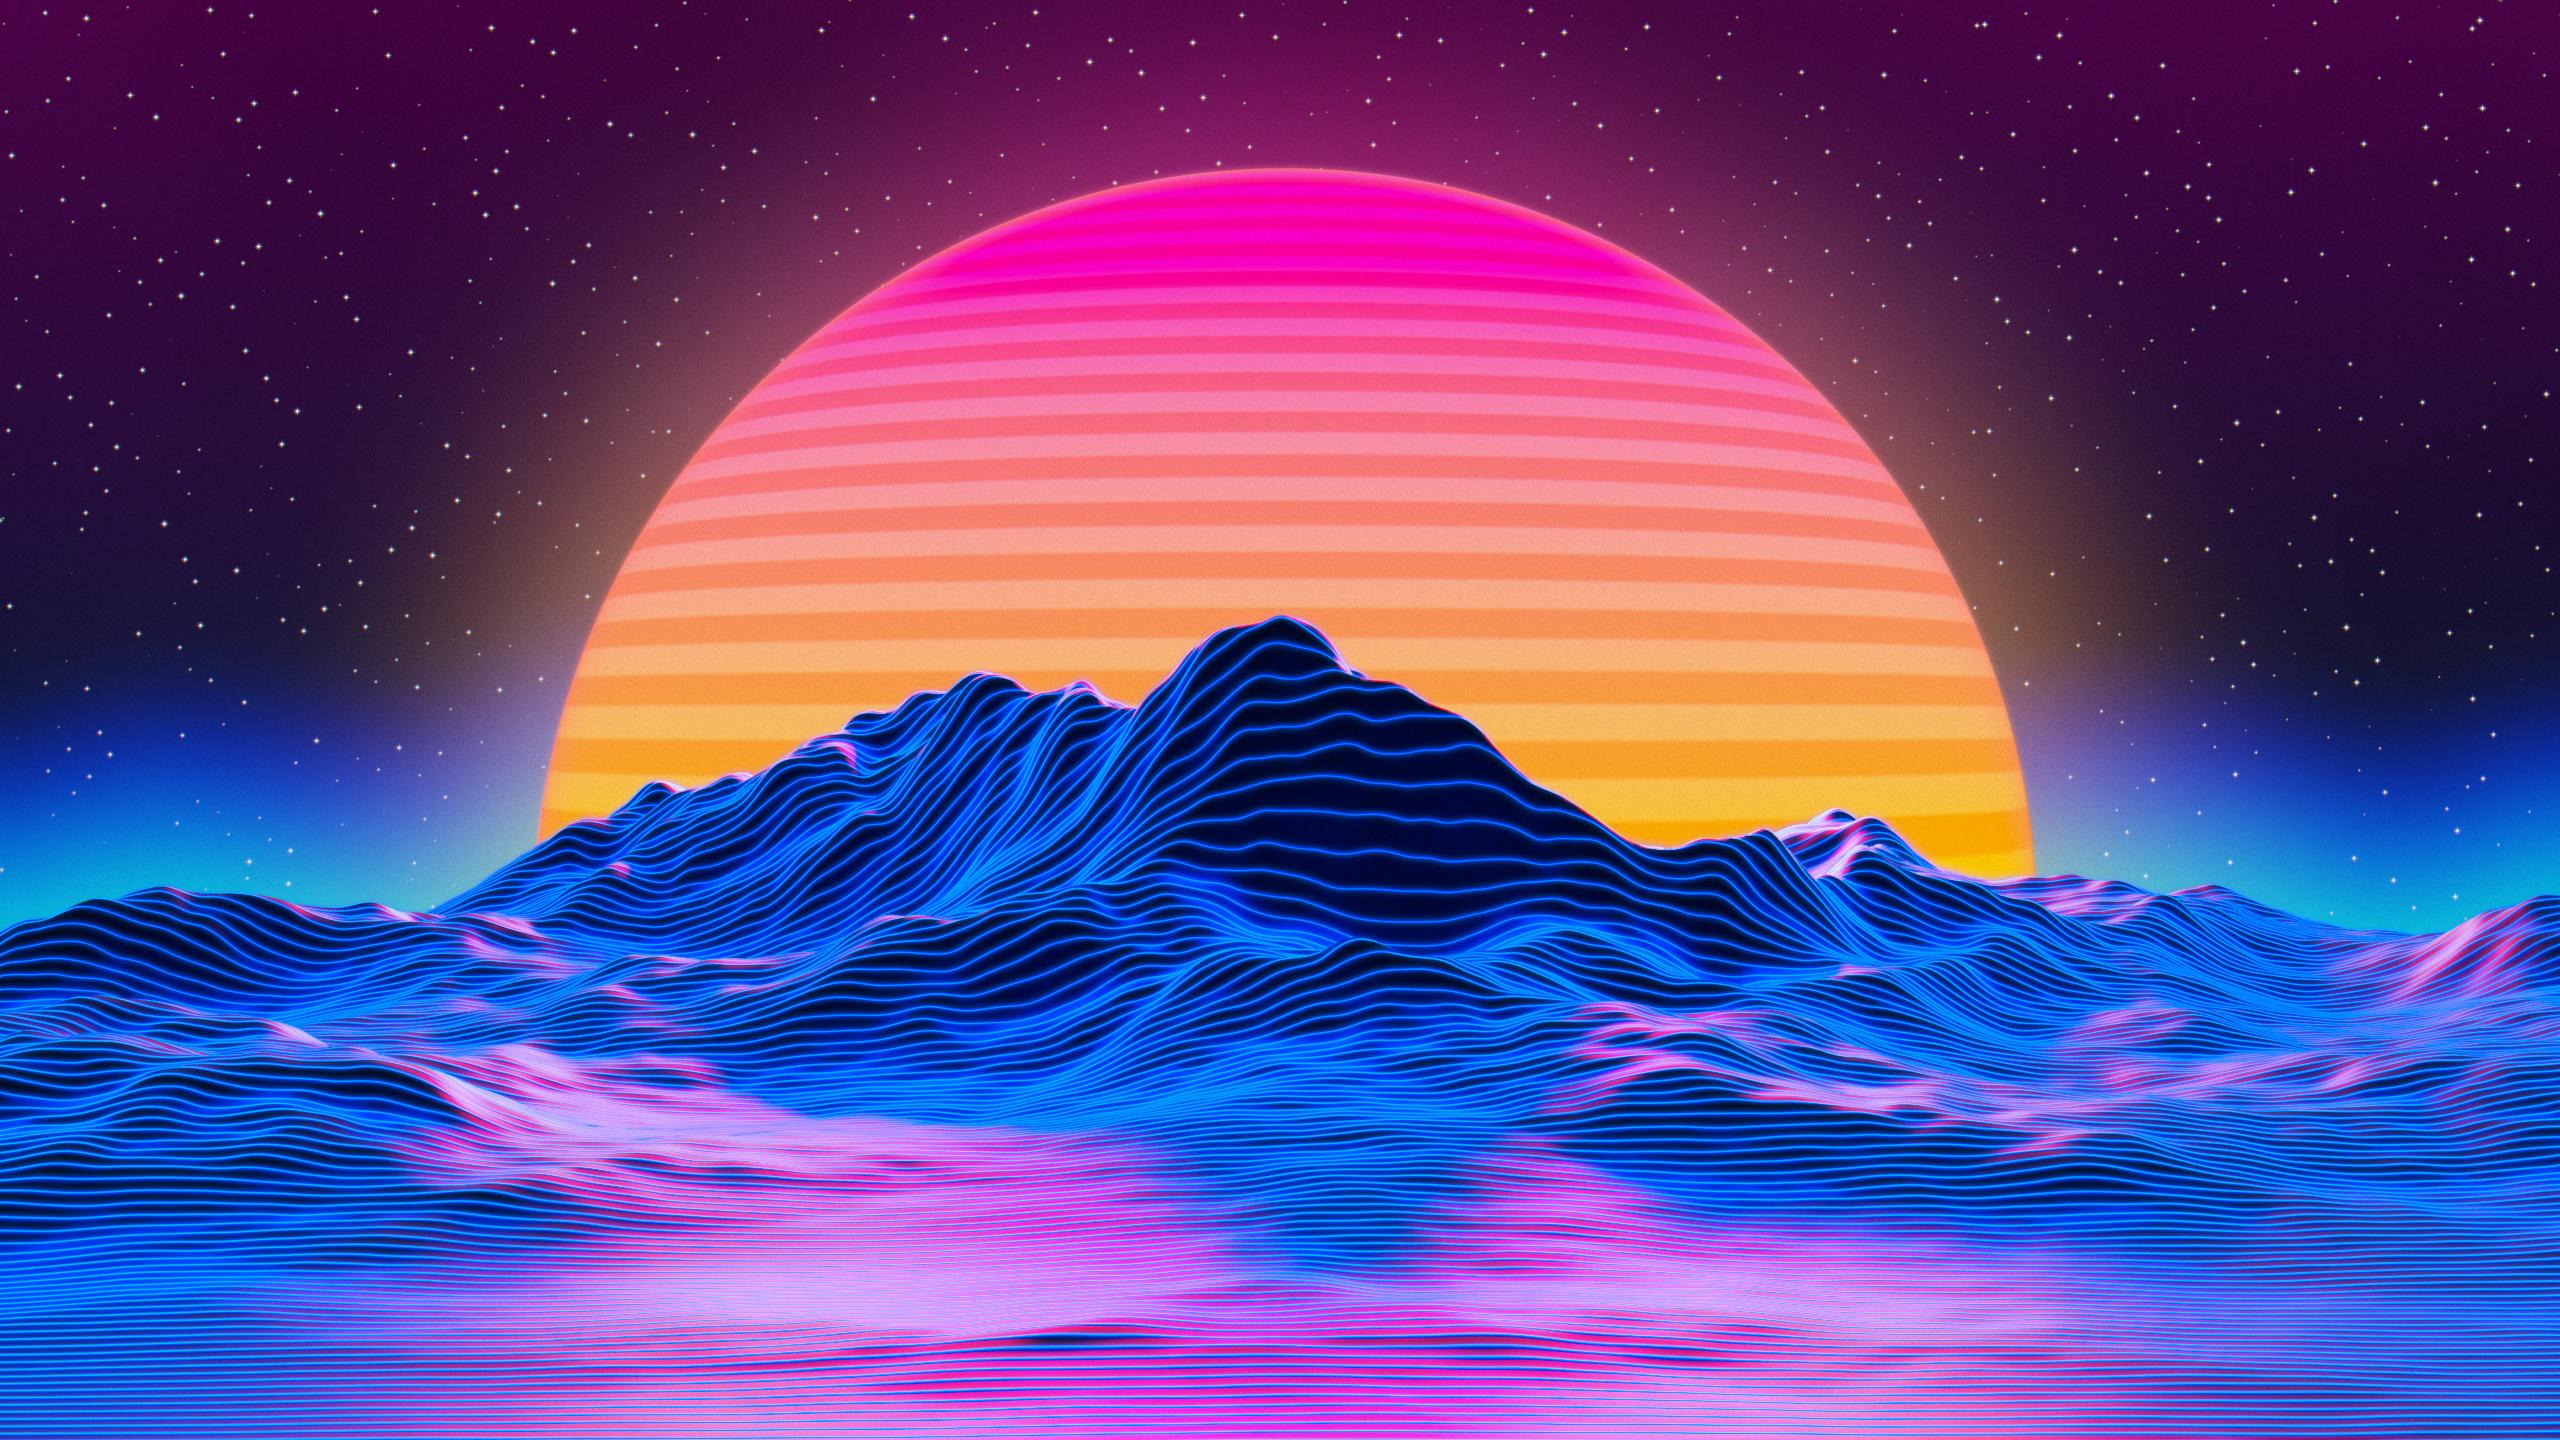 Retro style wallpaper [2560x1440] Desktop wallpaper art 2560x1440